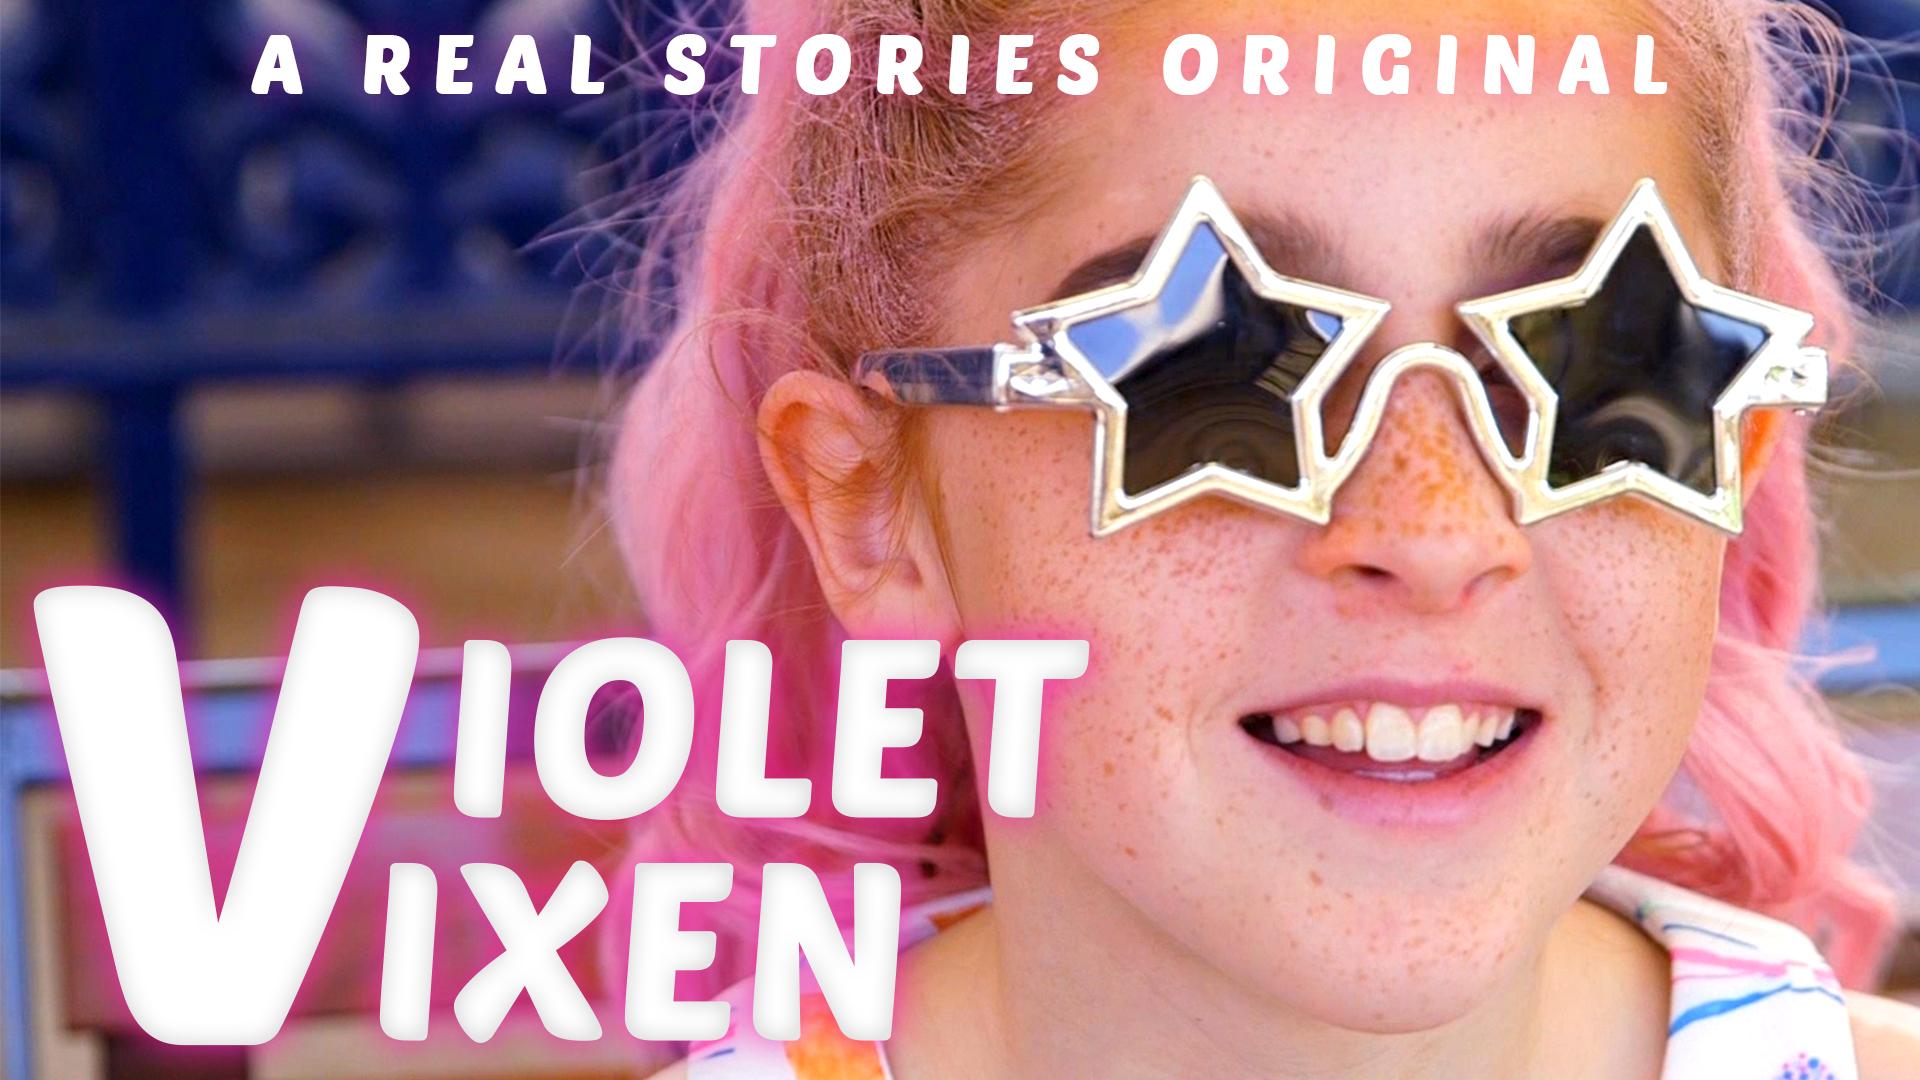 violet vixen poster real stories original documentary